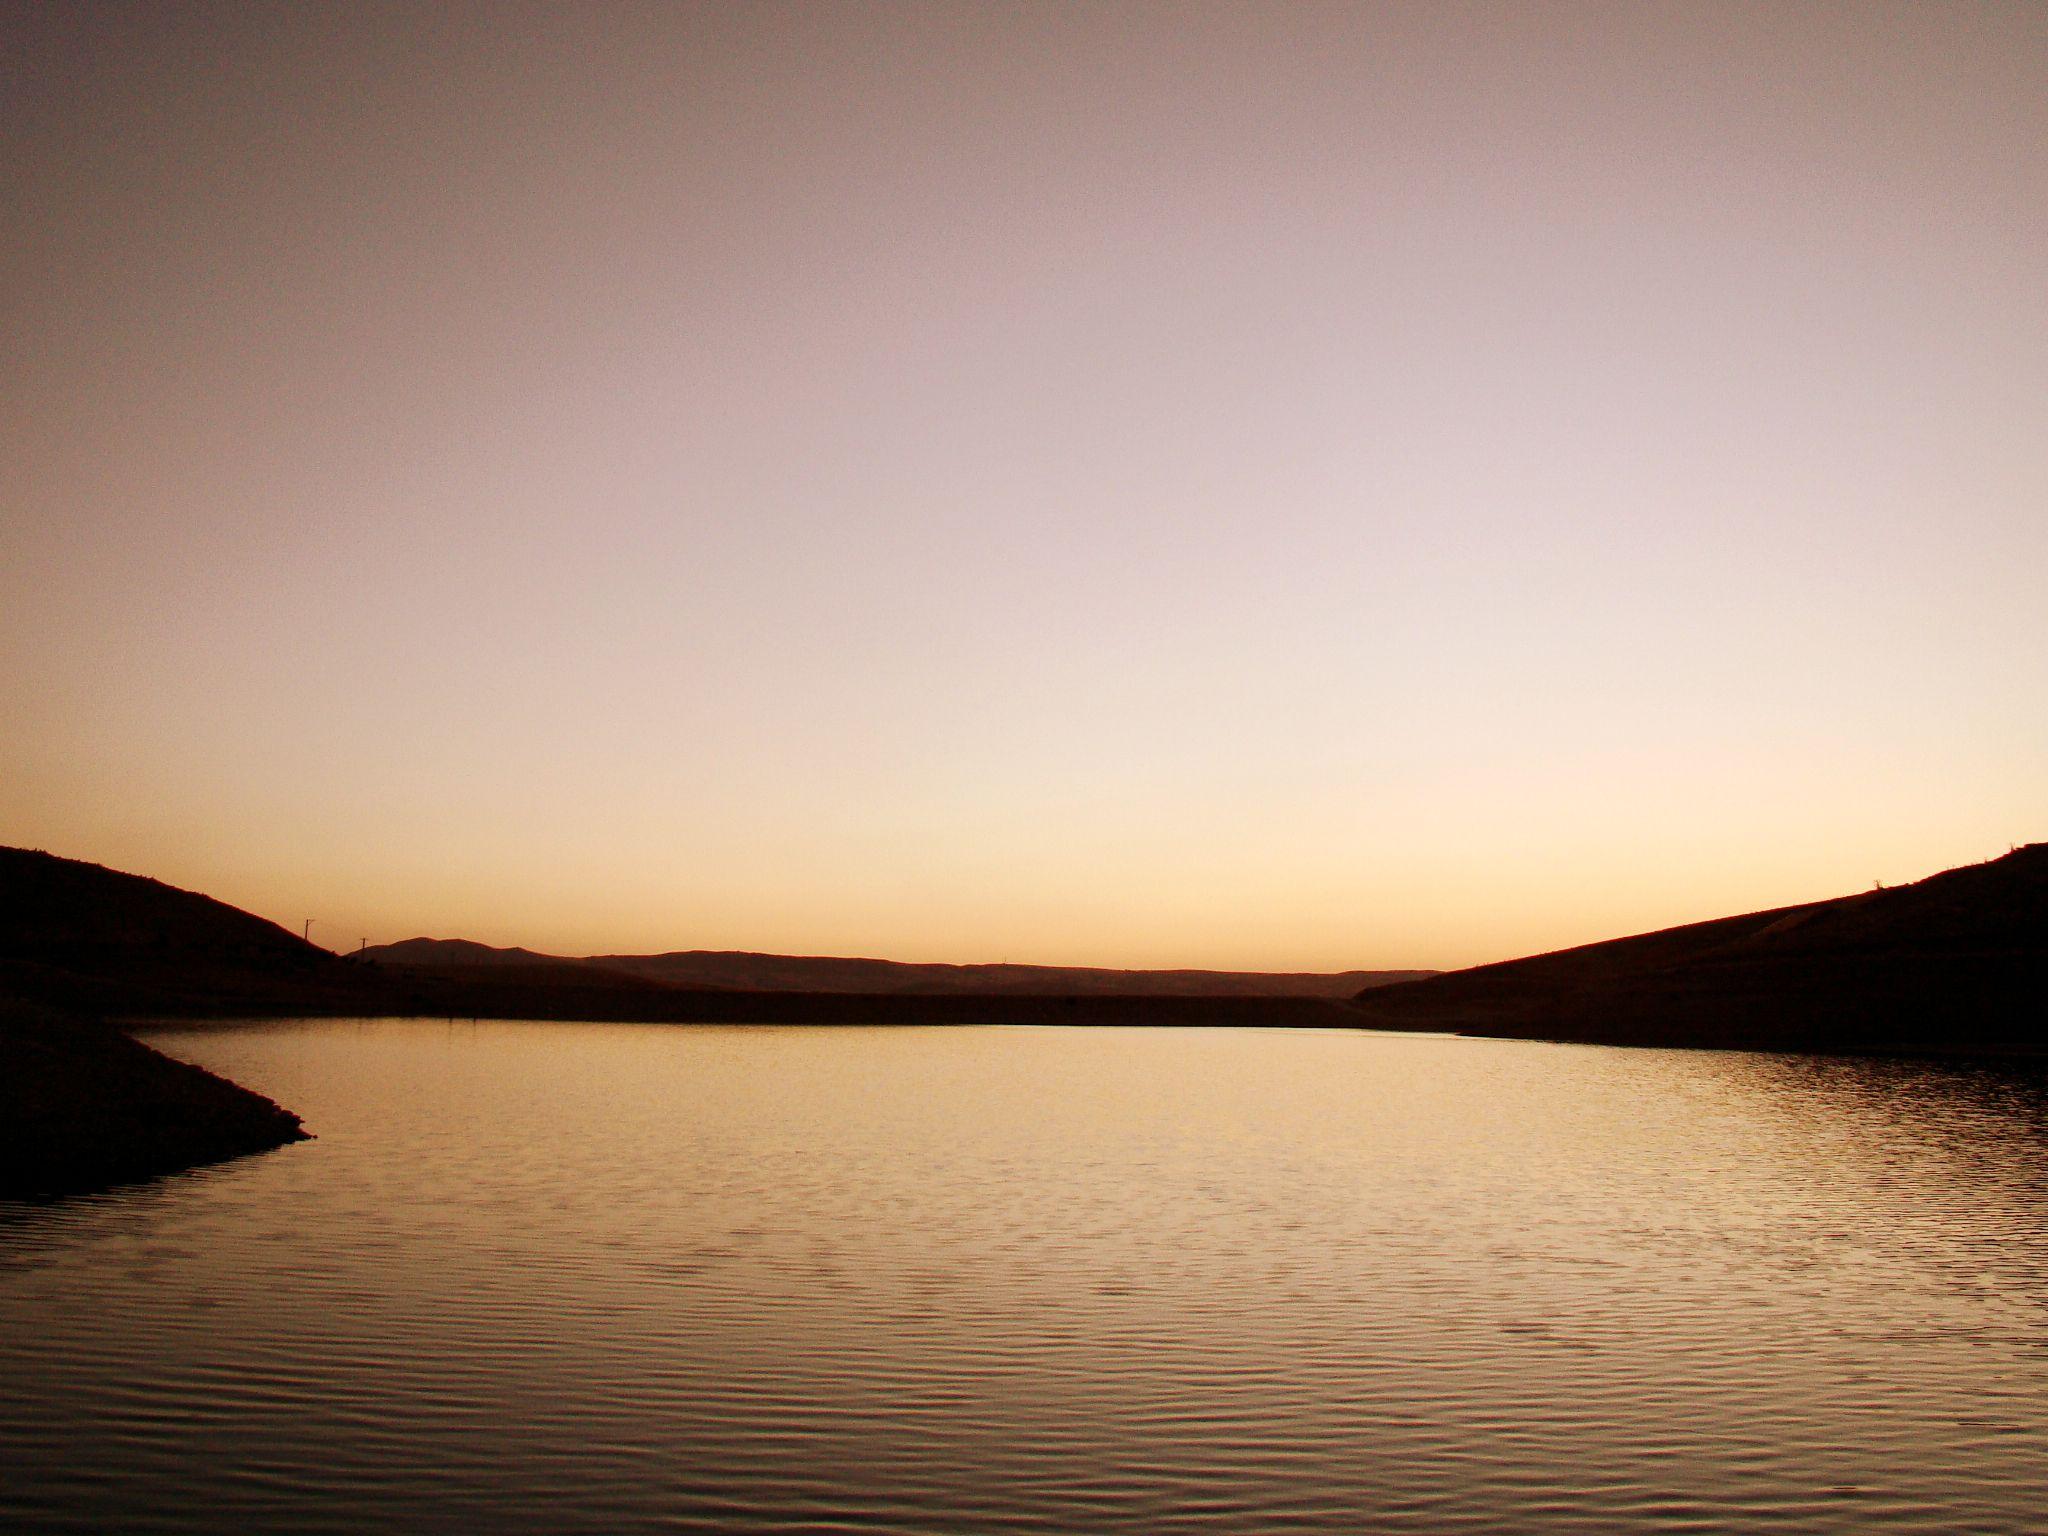 Sunset by Pooya Rafiei